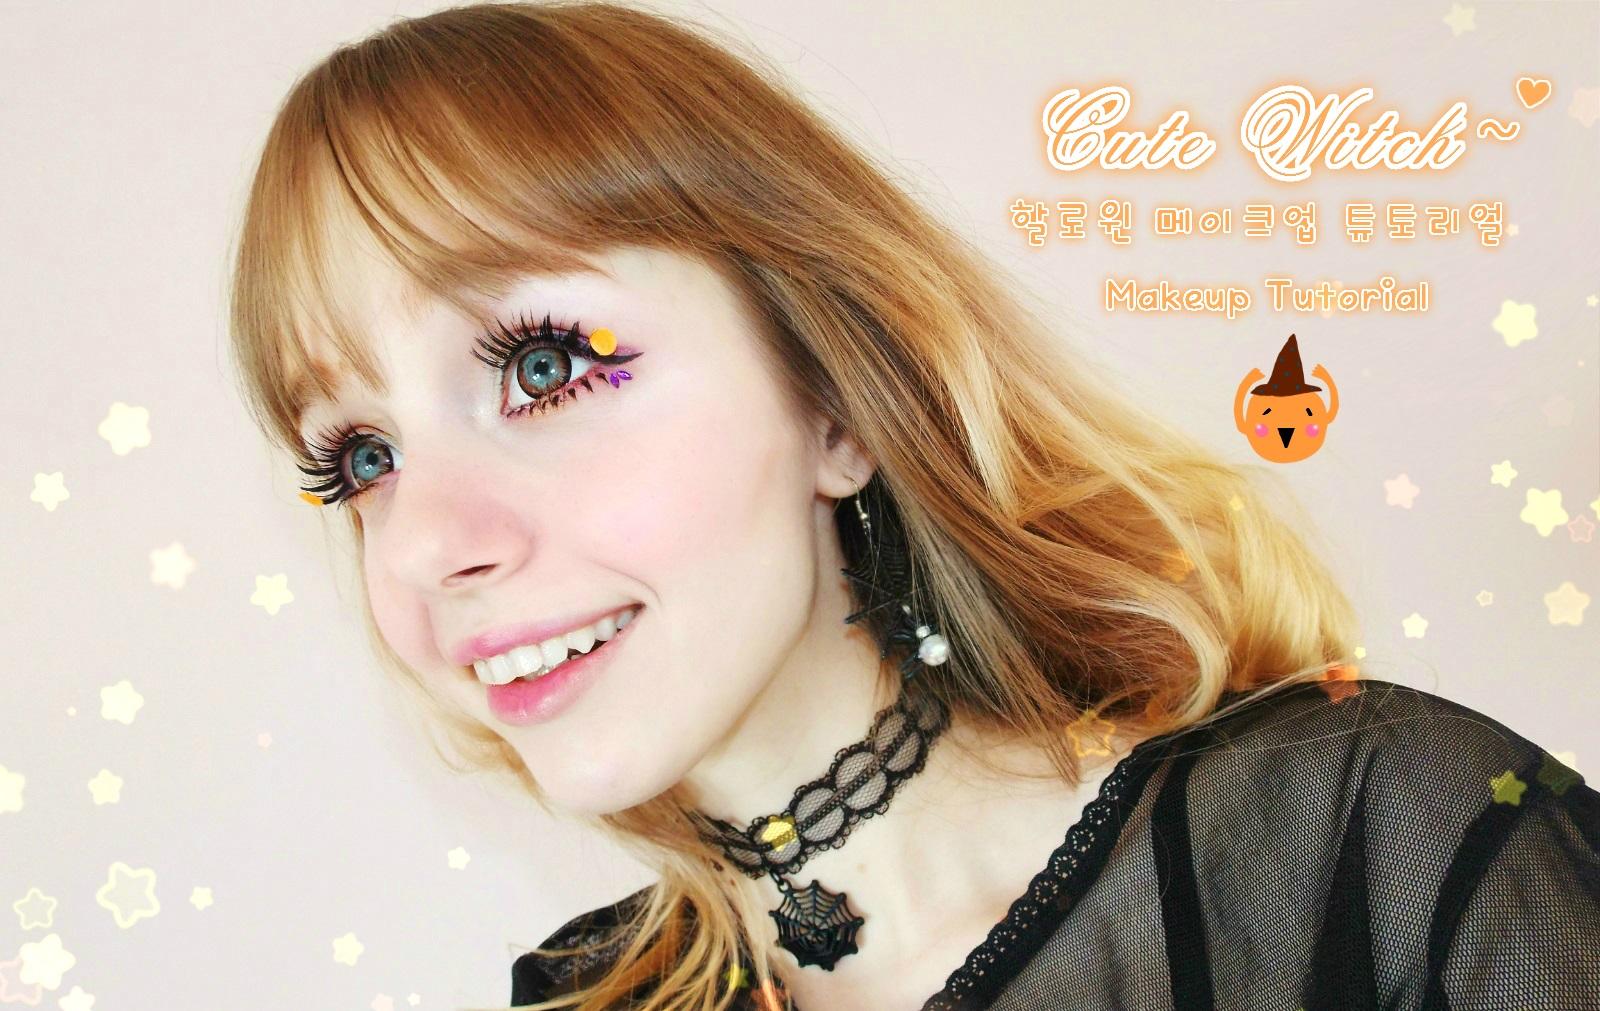 Keikeikirsten cute witch halloween makeup tutorial cute witch halloween makeup tutorial baditri Images